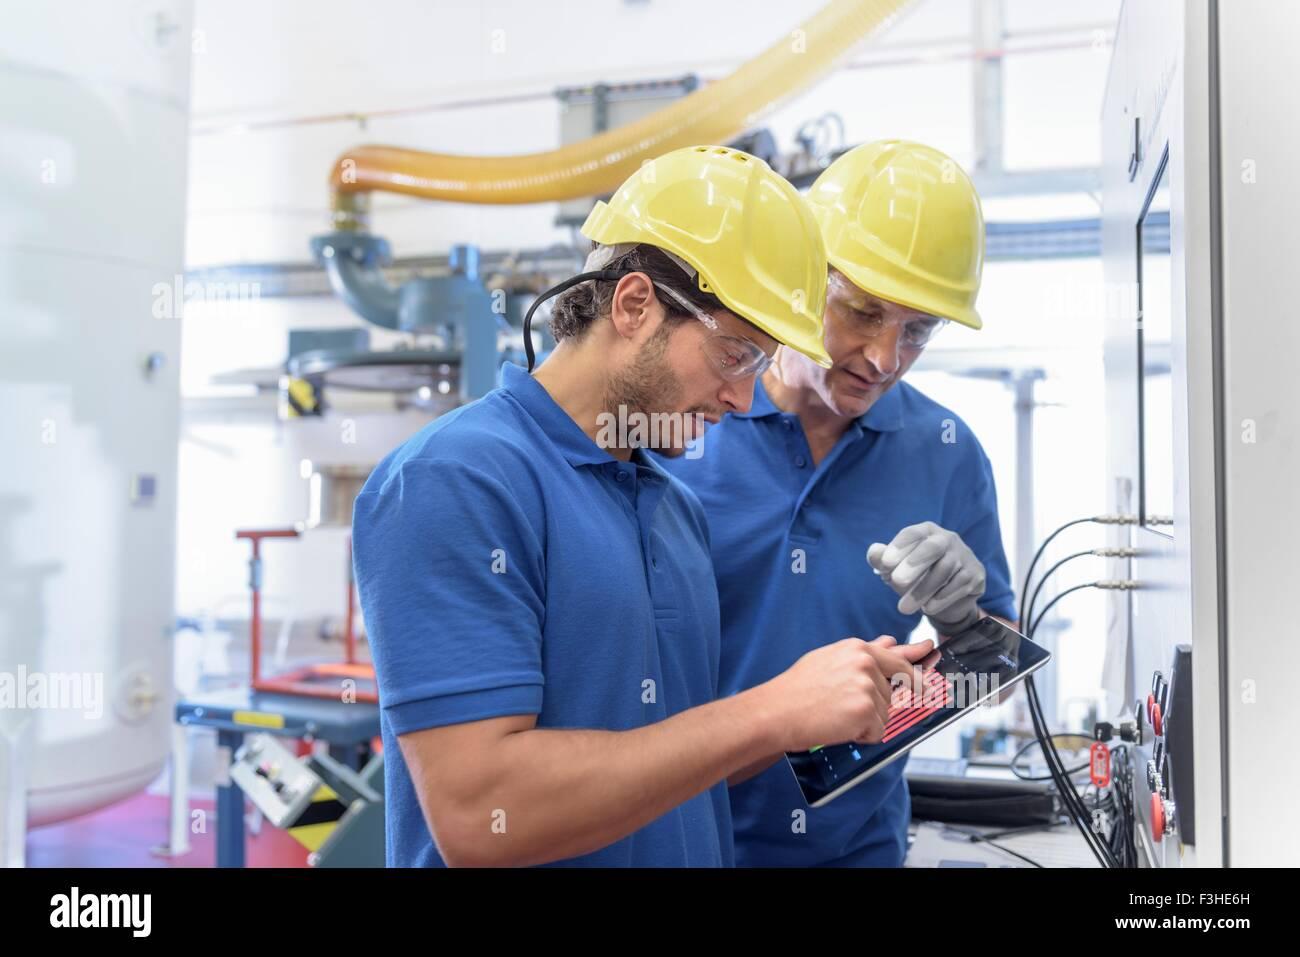 Arbeiter, die Umwelt Prüfgeräte mit digital-Tablette in Elektronik-Fabrik in Betrieb Stockbild